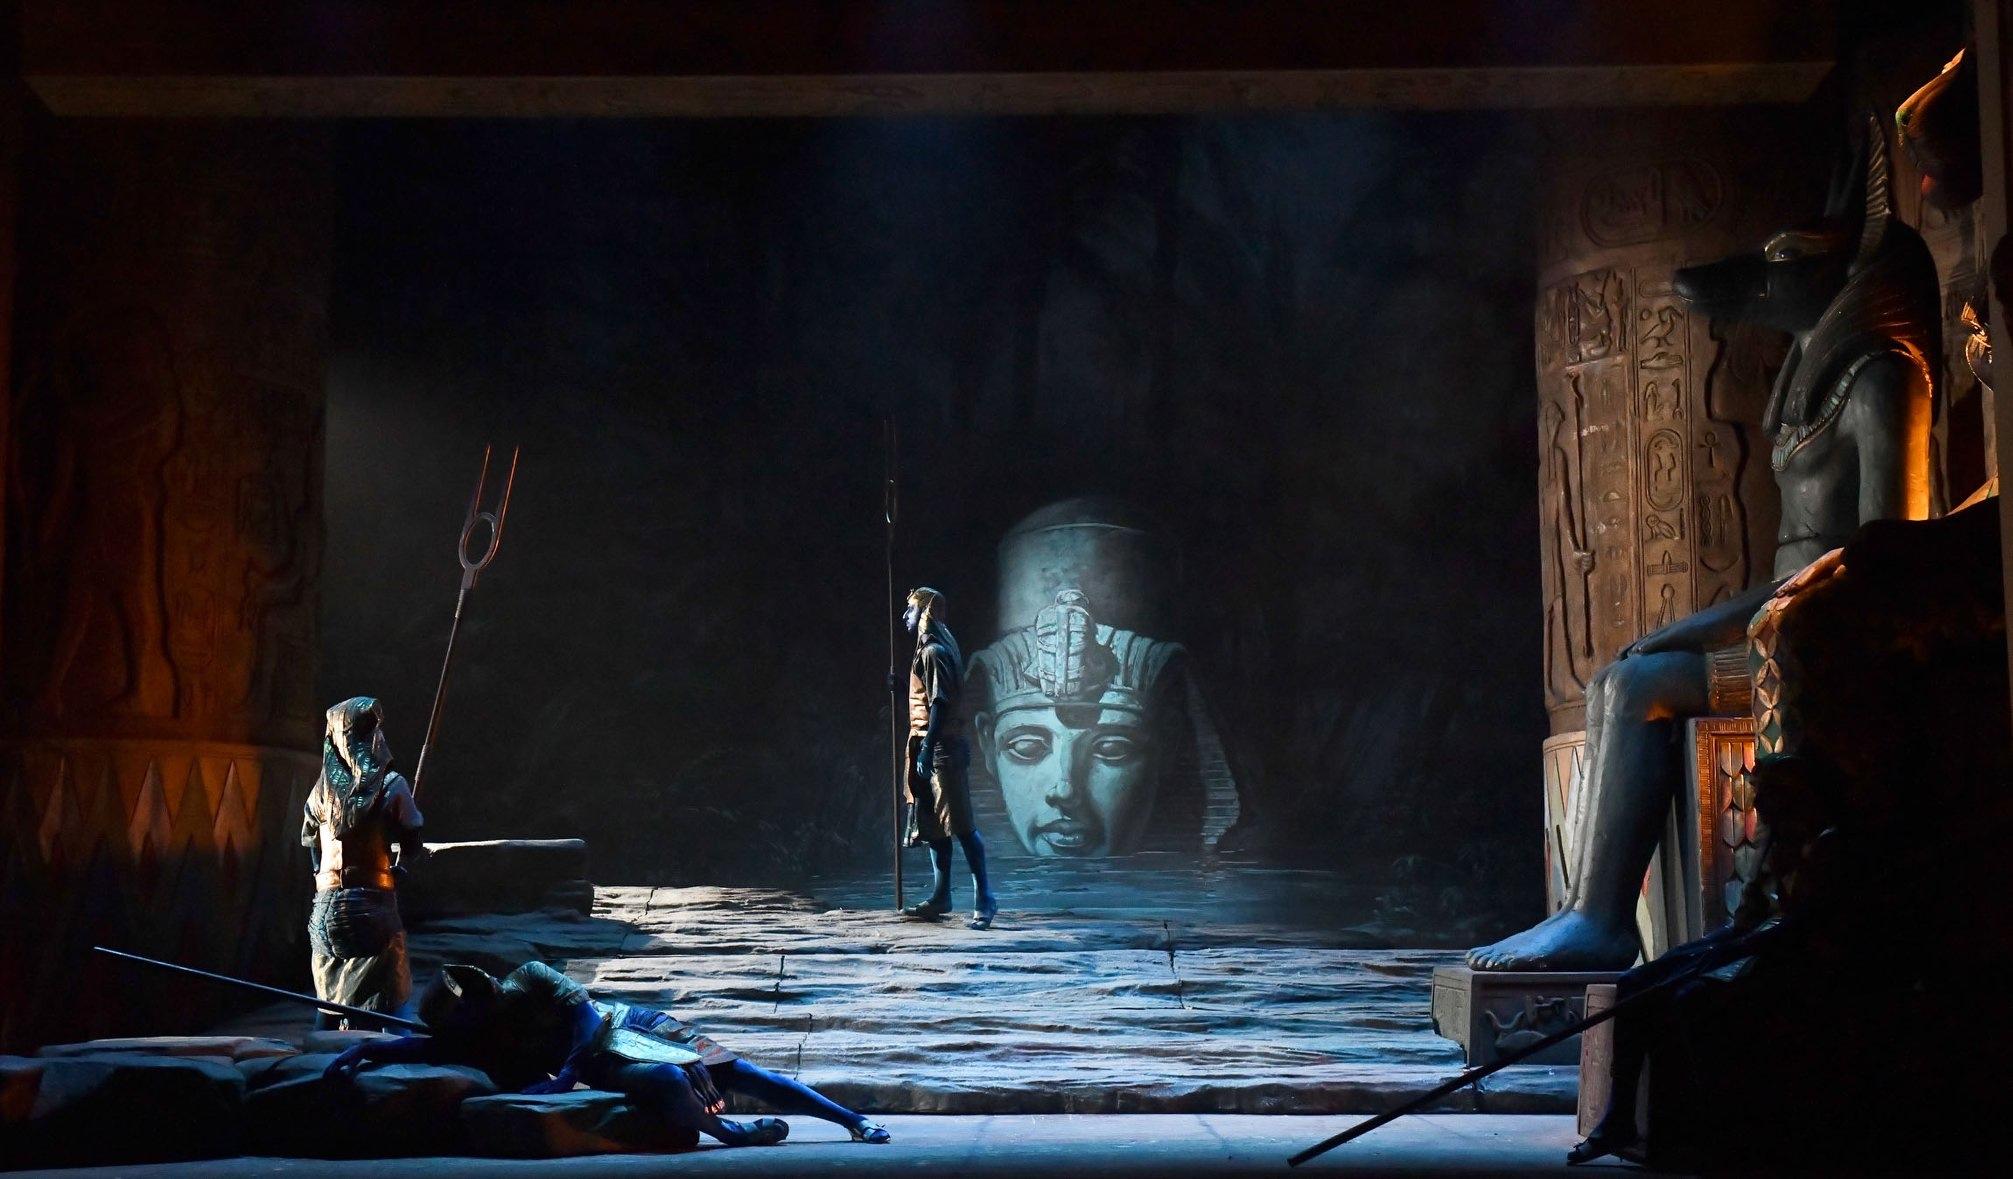 Aida Busseto - Festival Verdi 2019